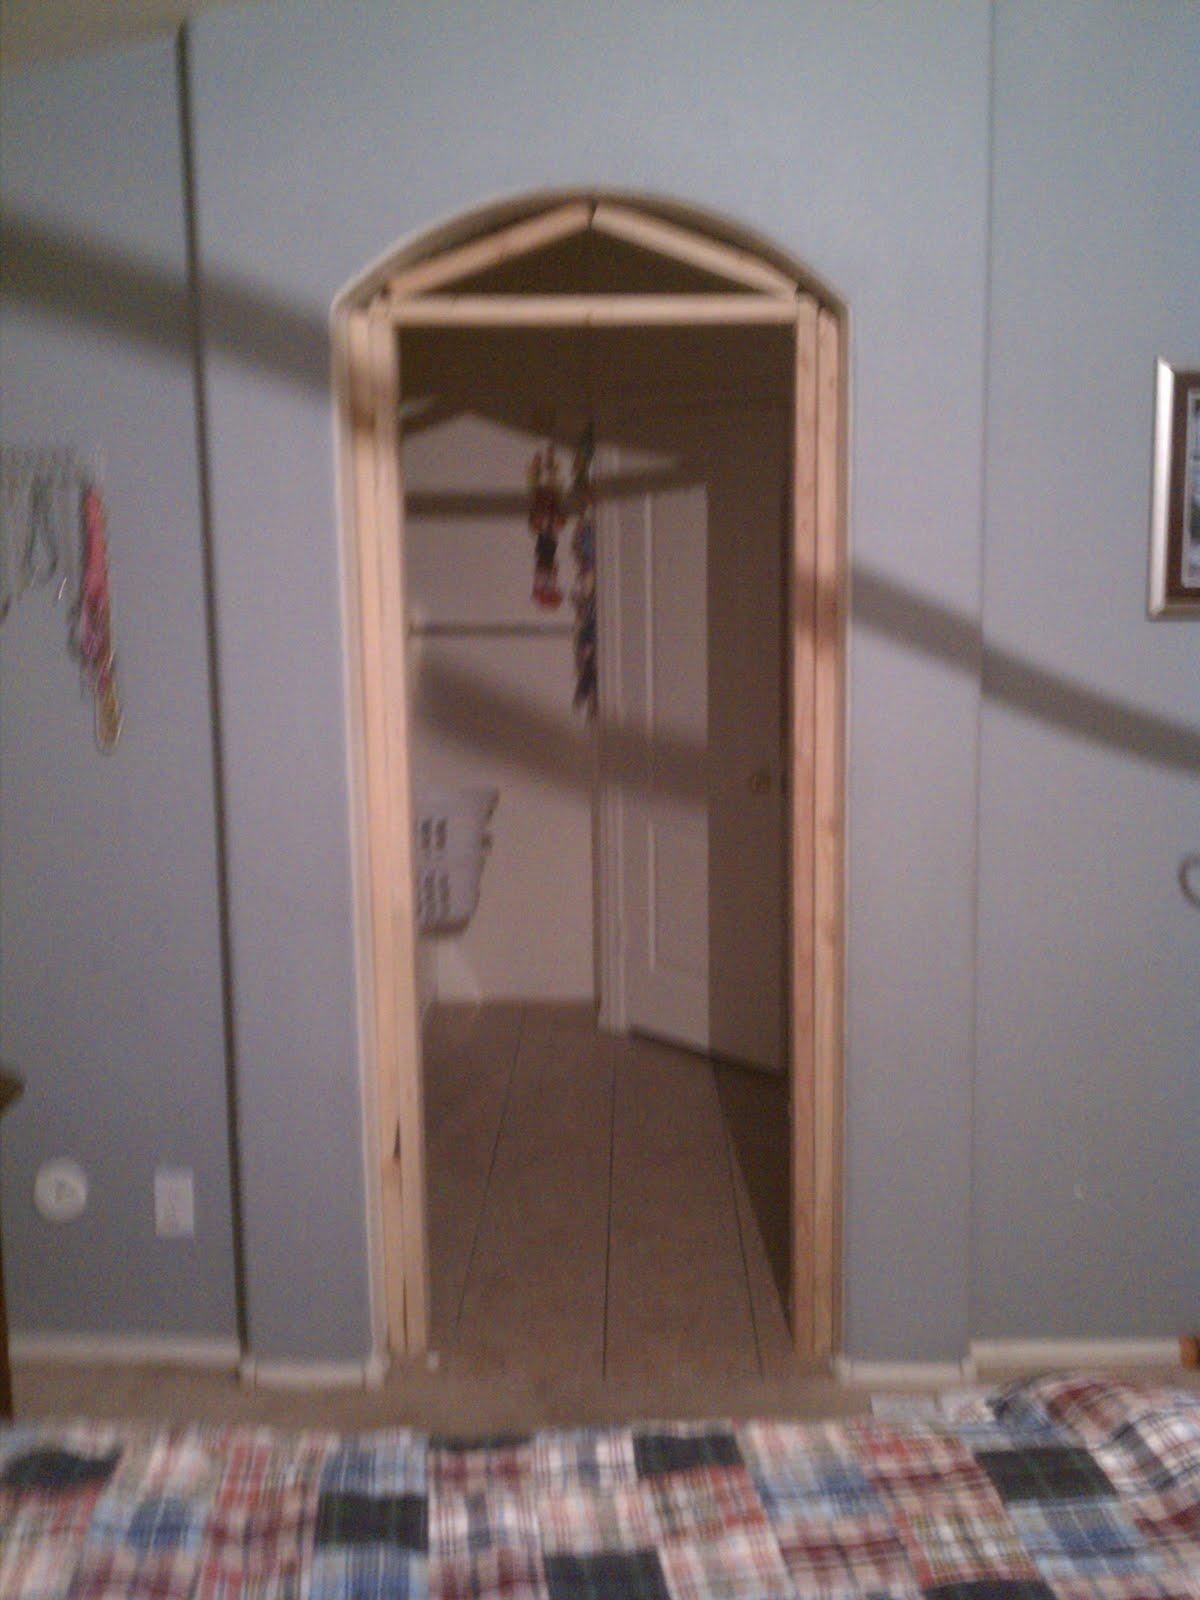 The Orange Jeep Dad Framing A Bathroom Archway to Add A Door